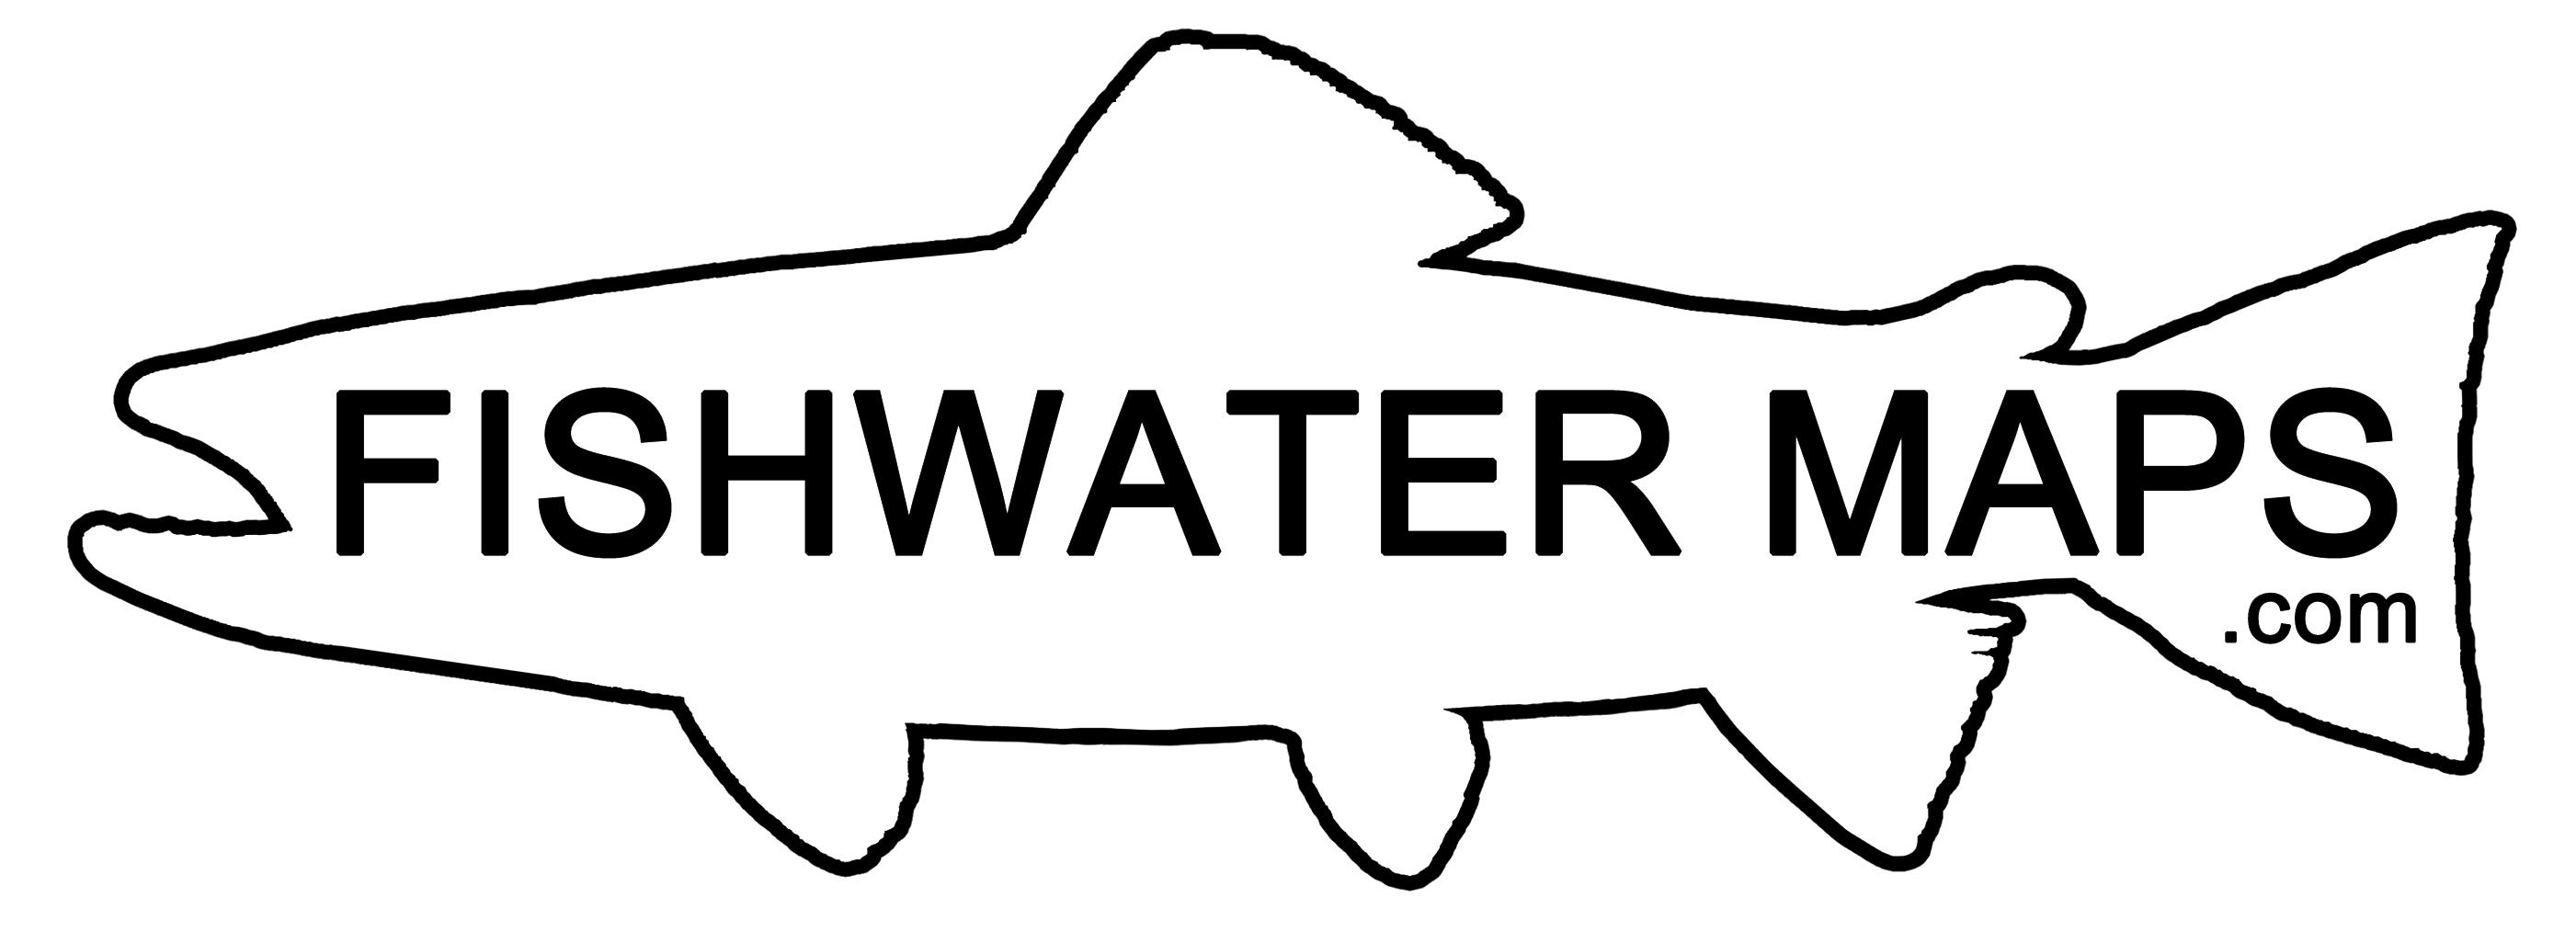 FishwaterMaps.com